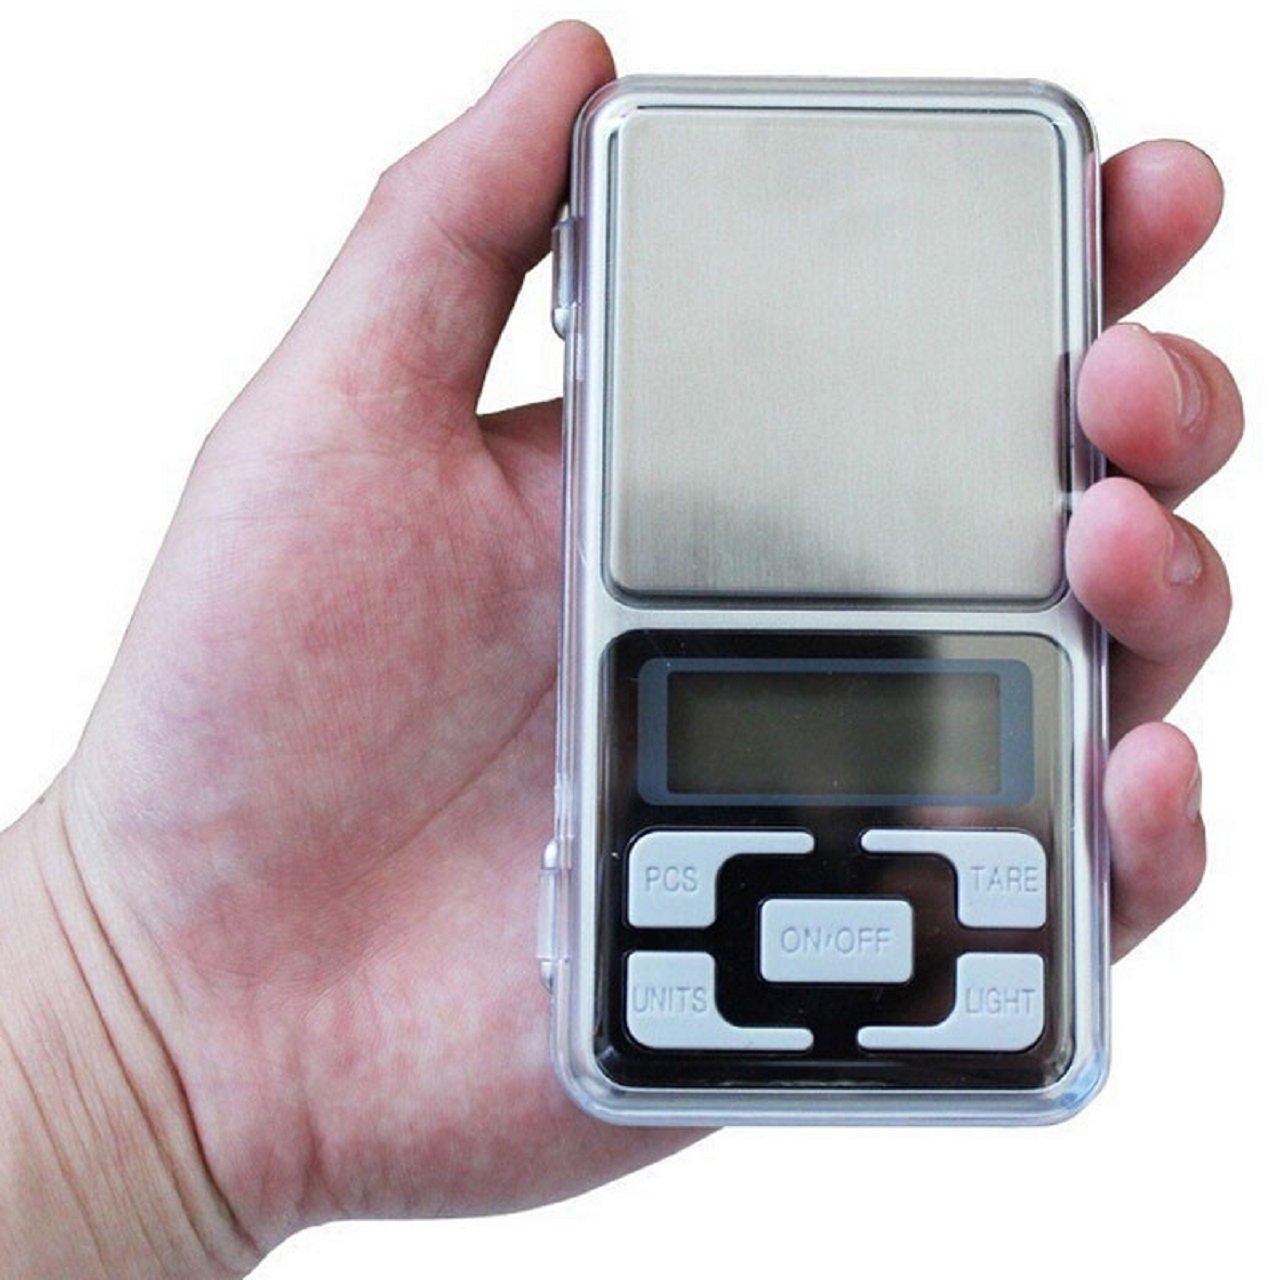 Jewelry Digital Scale, Rcool 200g x 0.01g Gold Herb Balance Weight Gram LCD